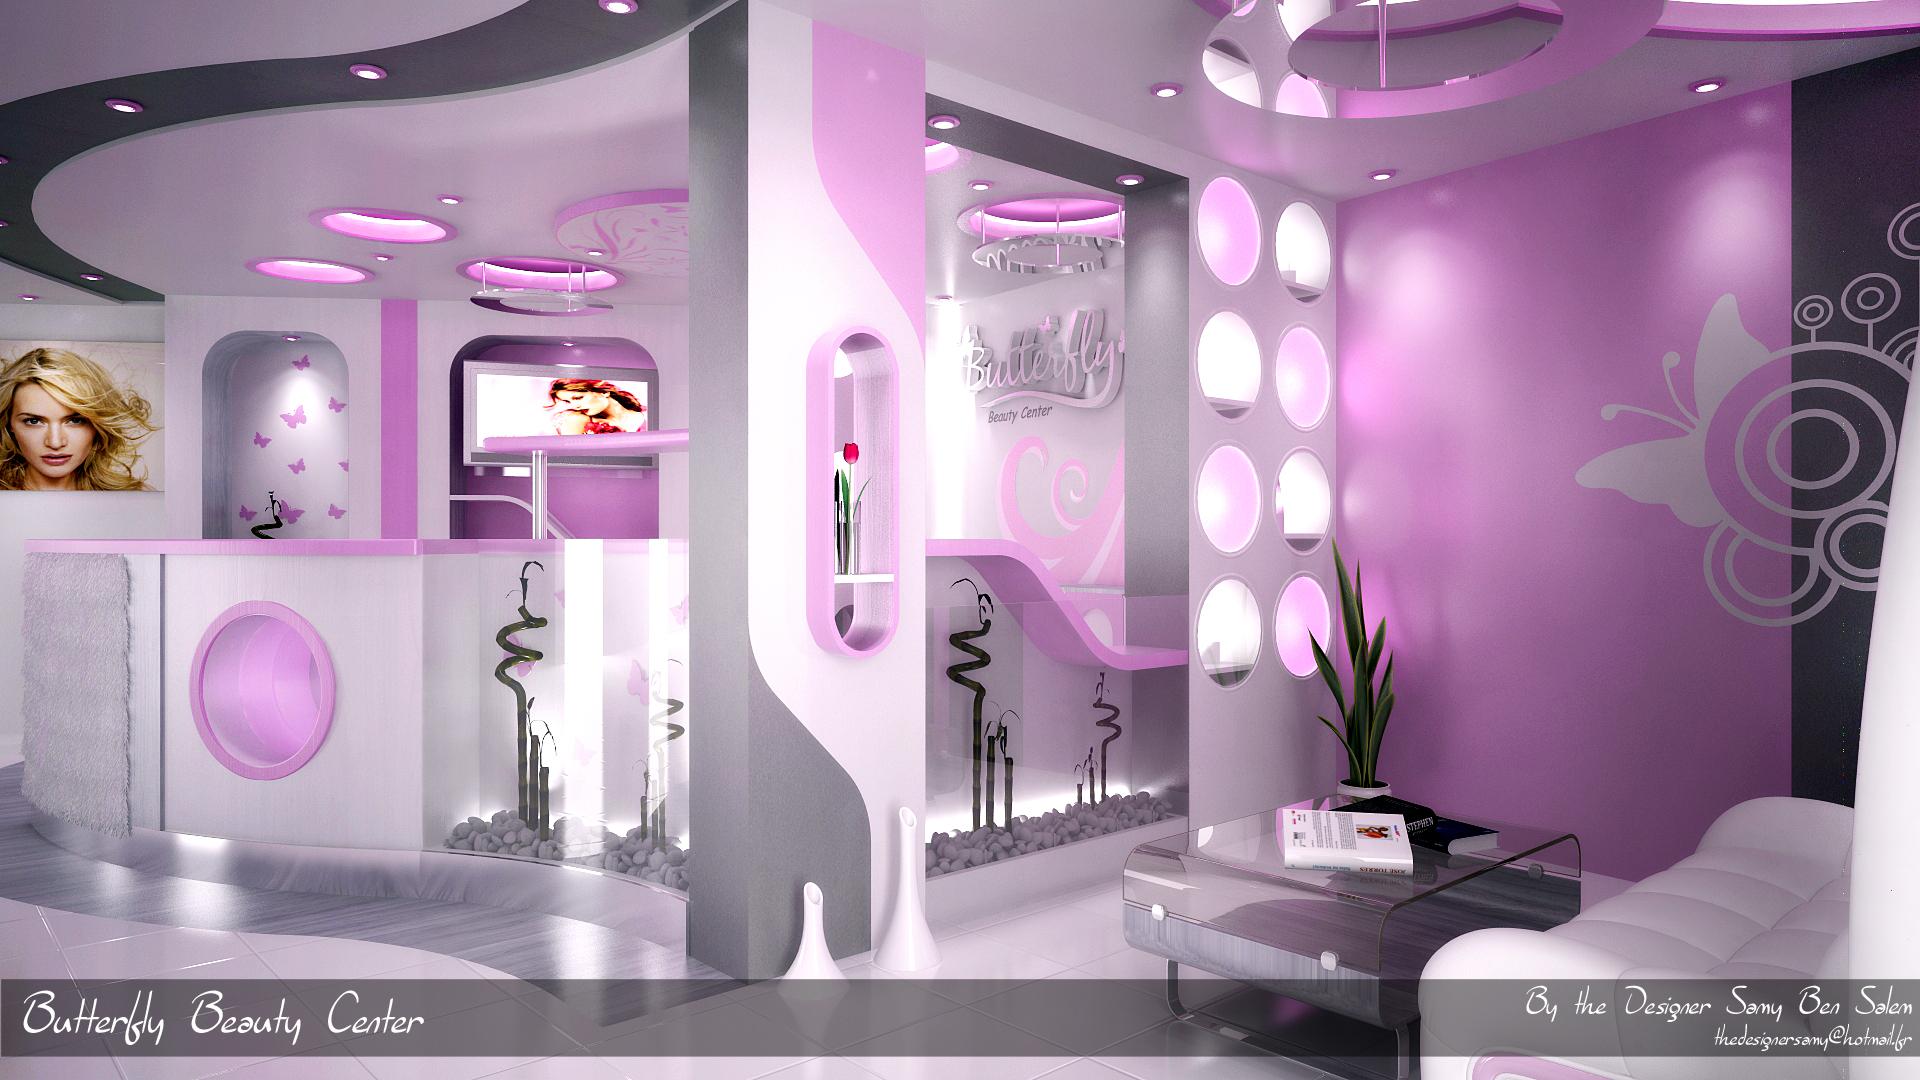 Beauty centers design interior design interior design certification - H Favorite Qview Full Size